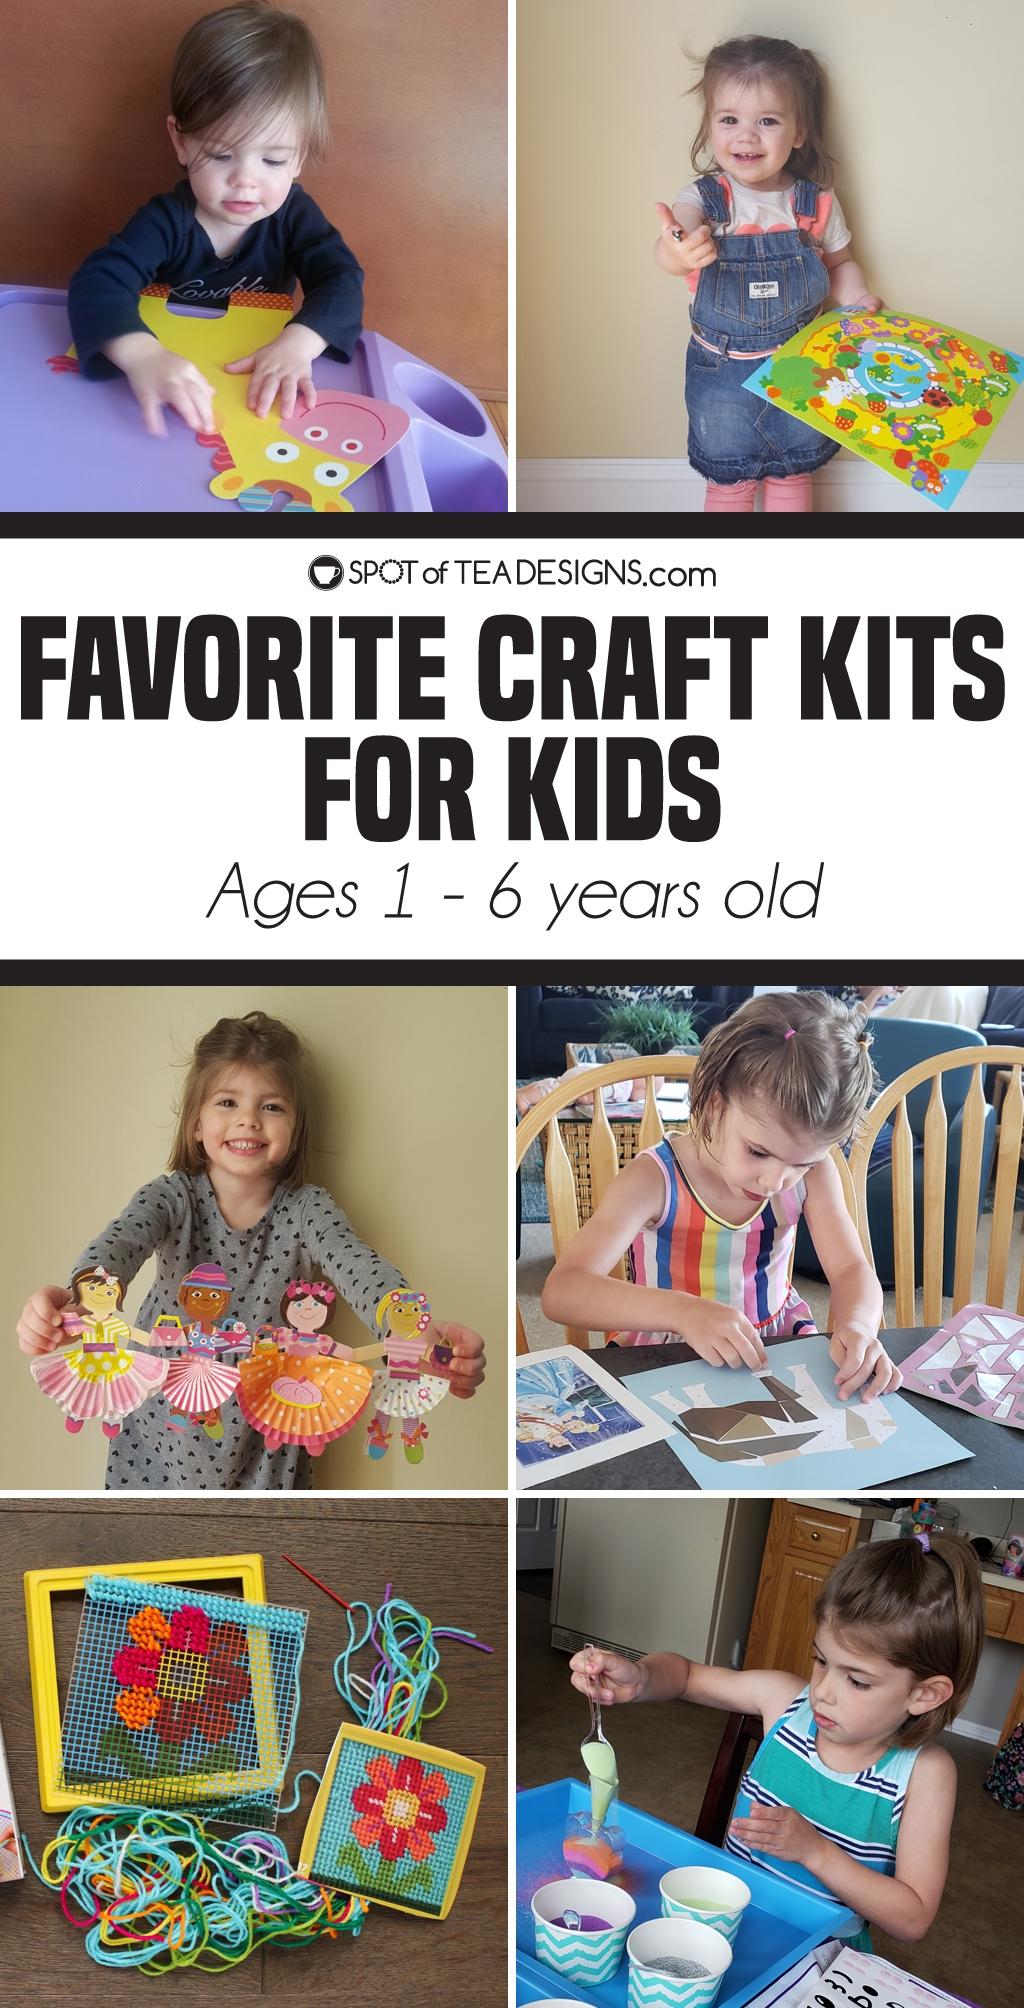 Favorite craft kits for kids ages 1 - 6 | spotofteadesigns.com